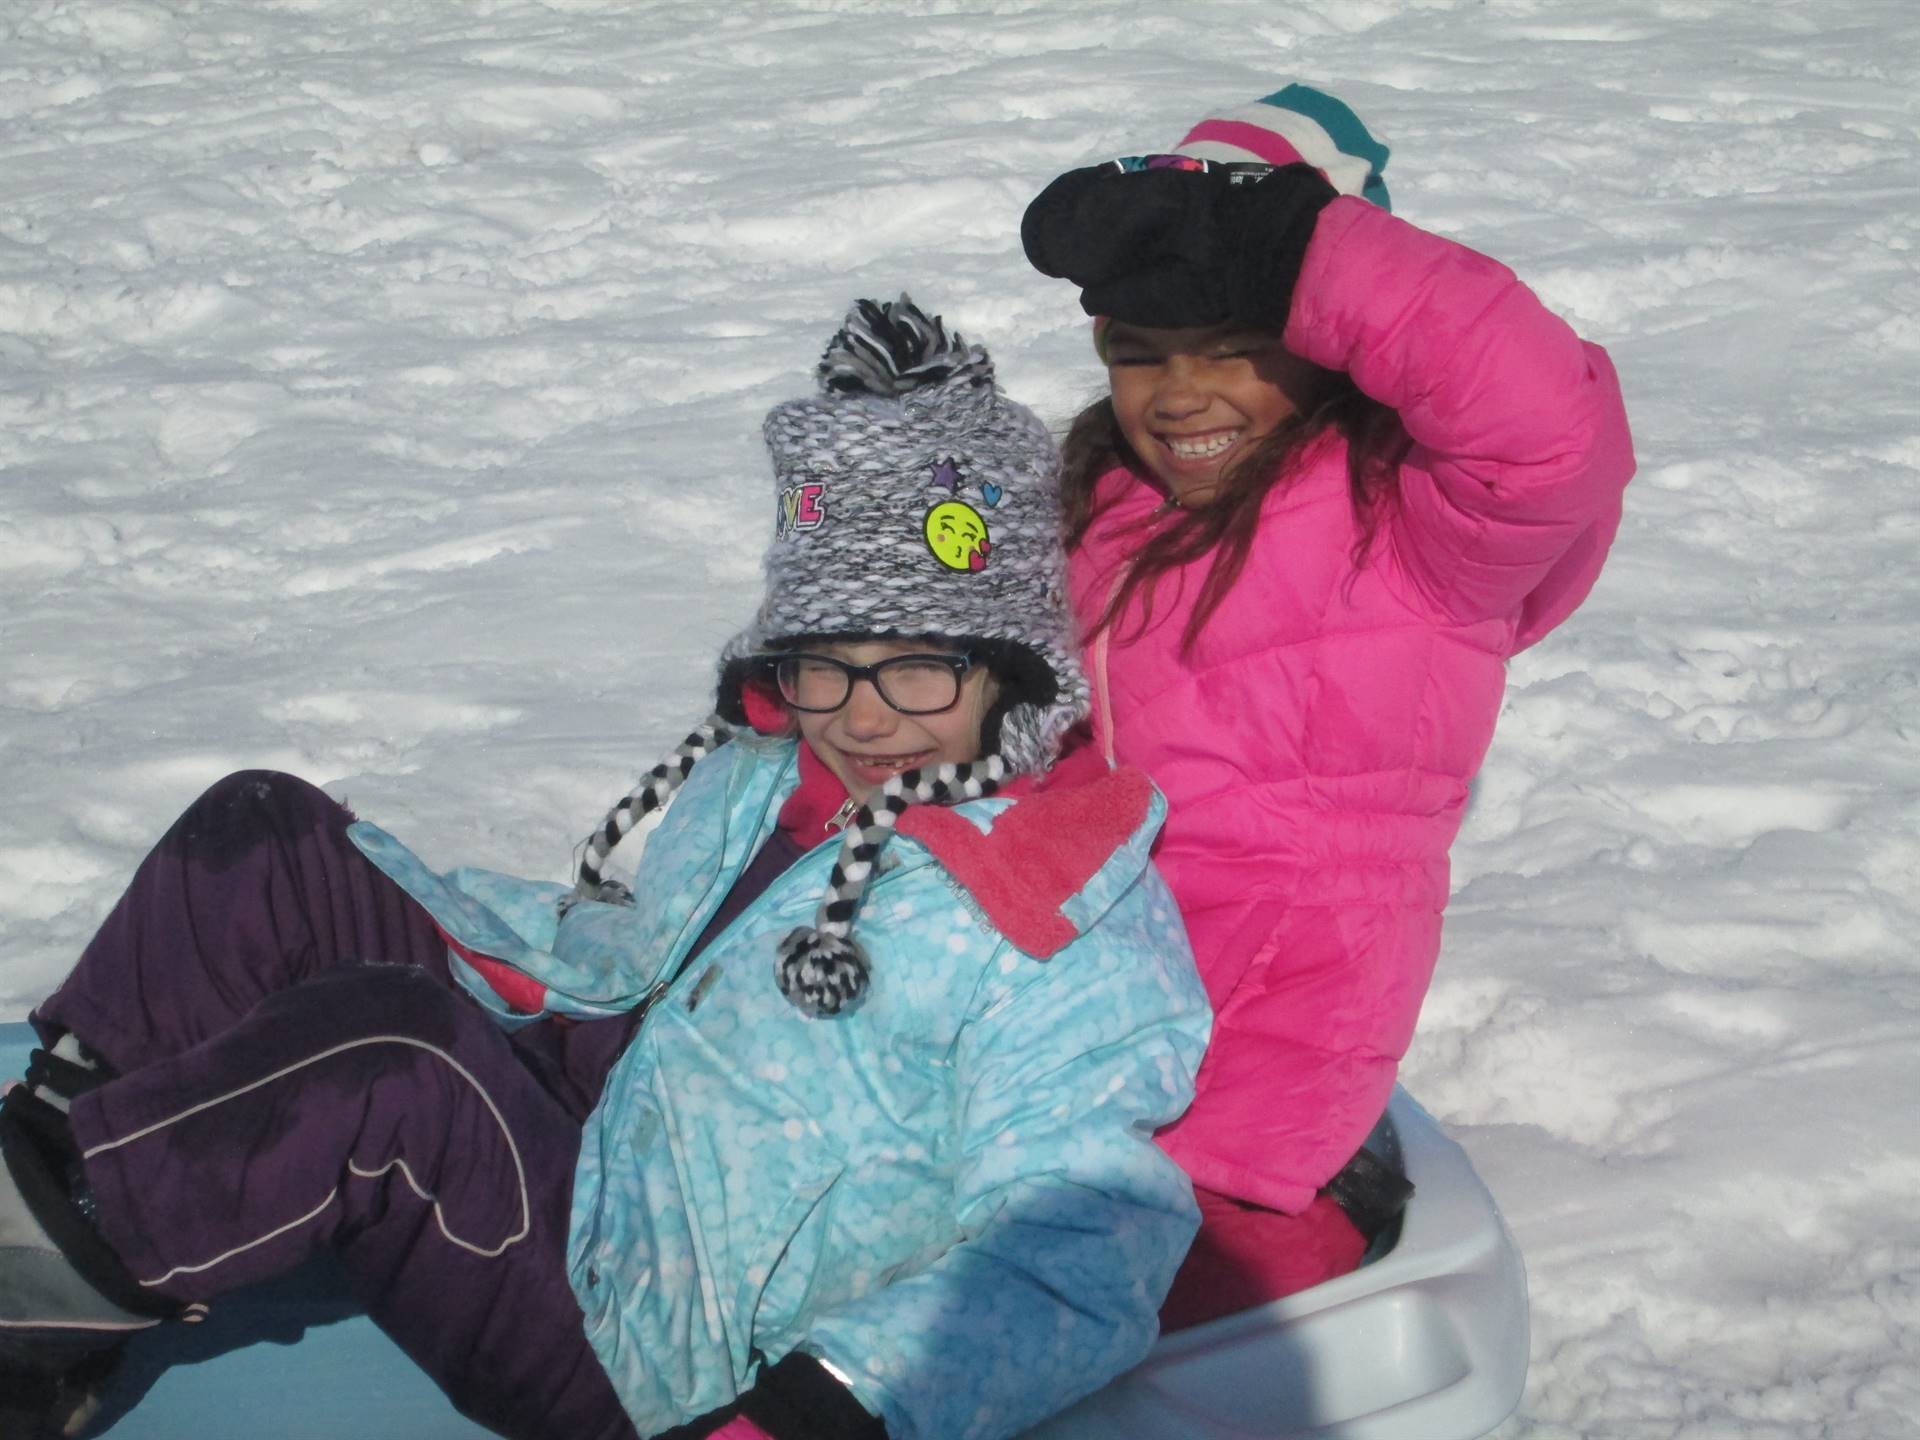 2 Girls sledding